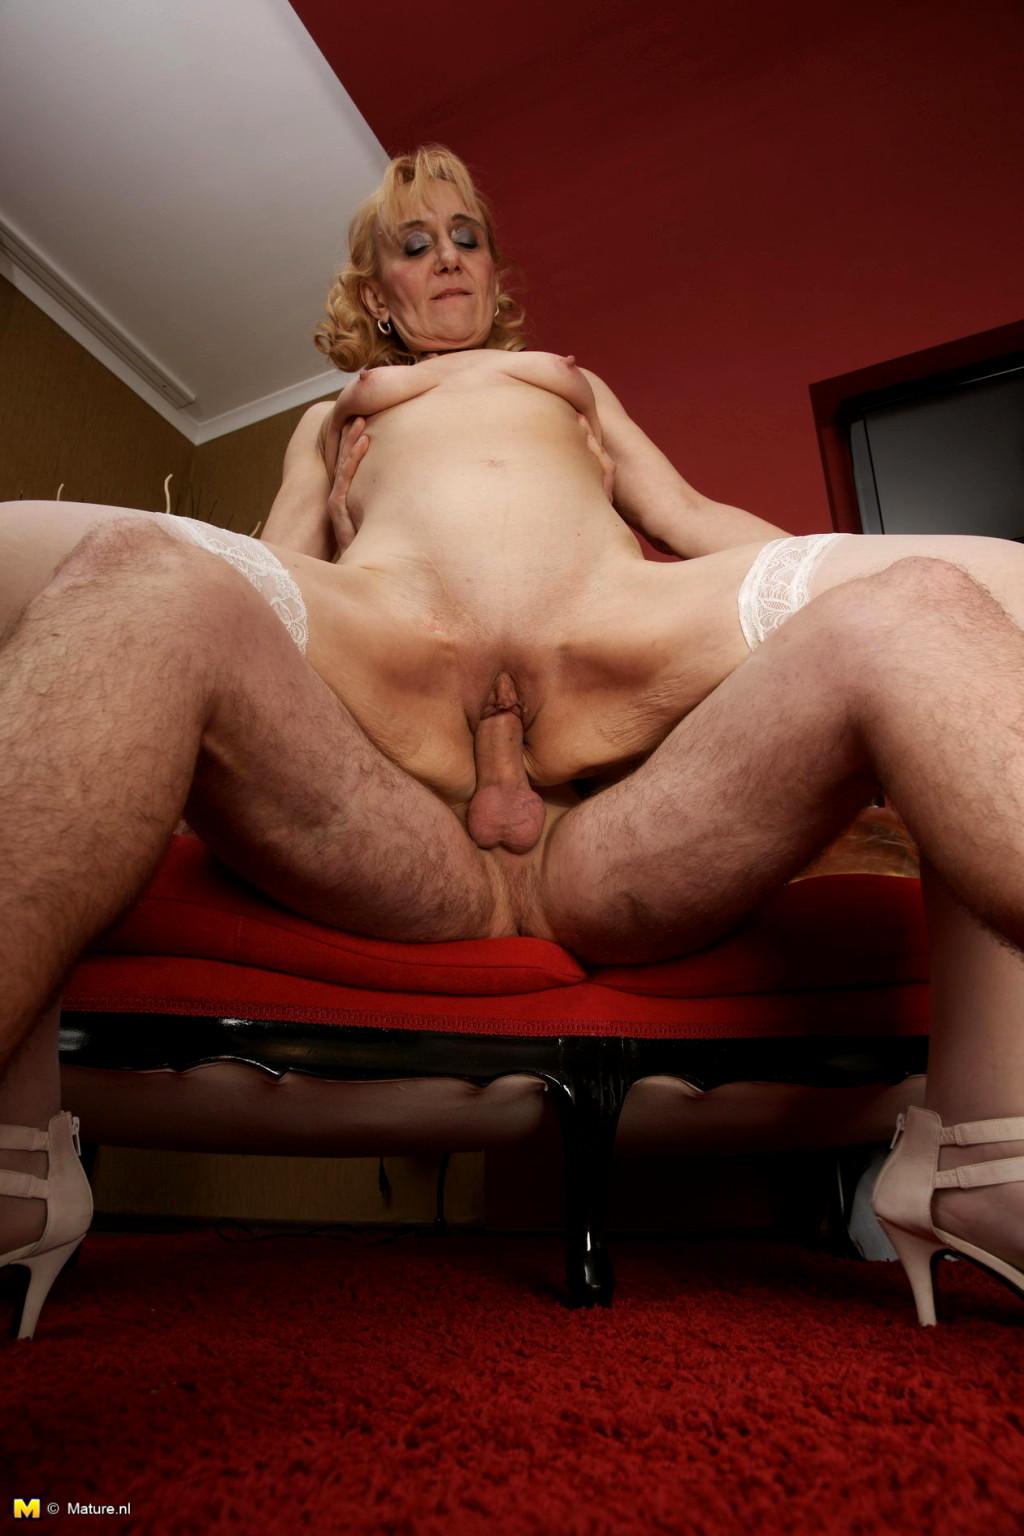 Mature Nl Maturenl Model Download Lingerie Art Sex Hd Pics-9865